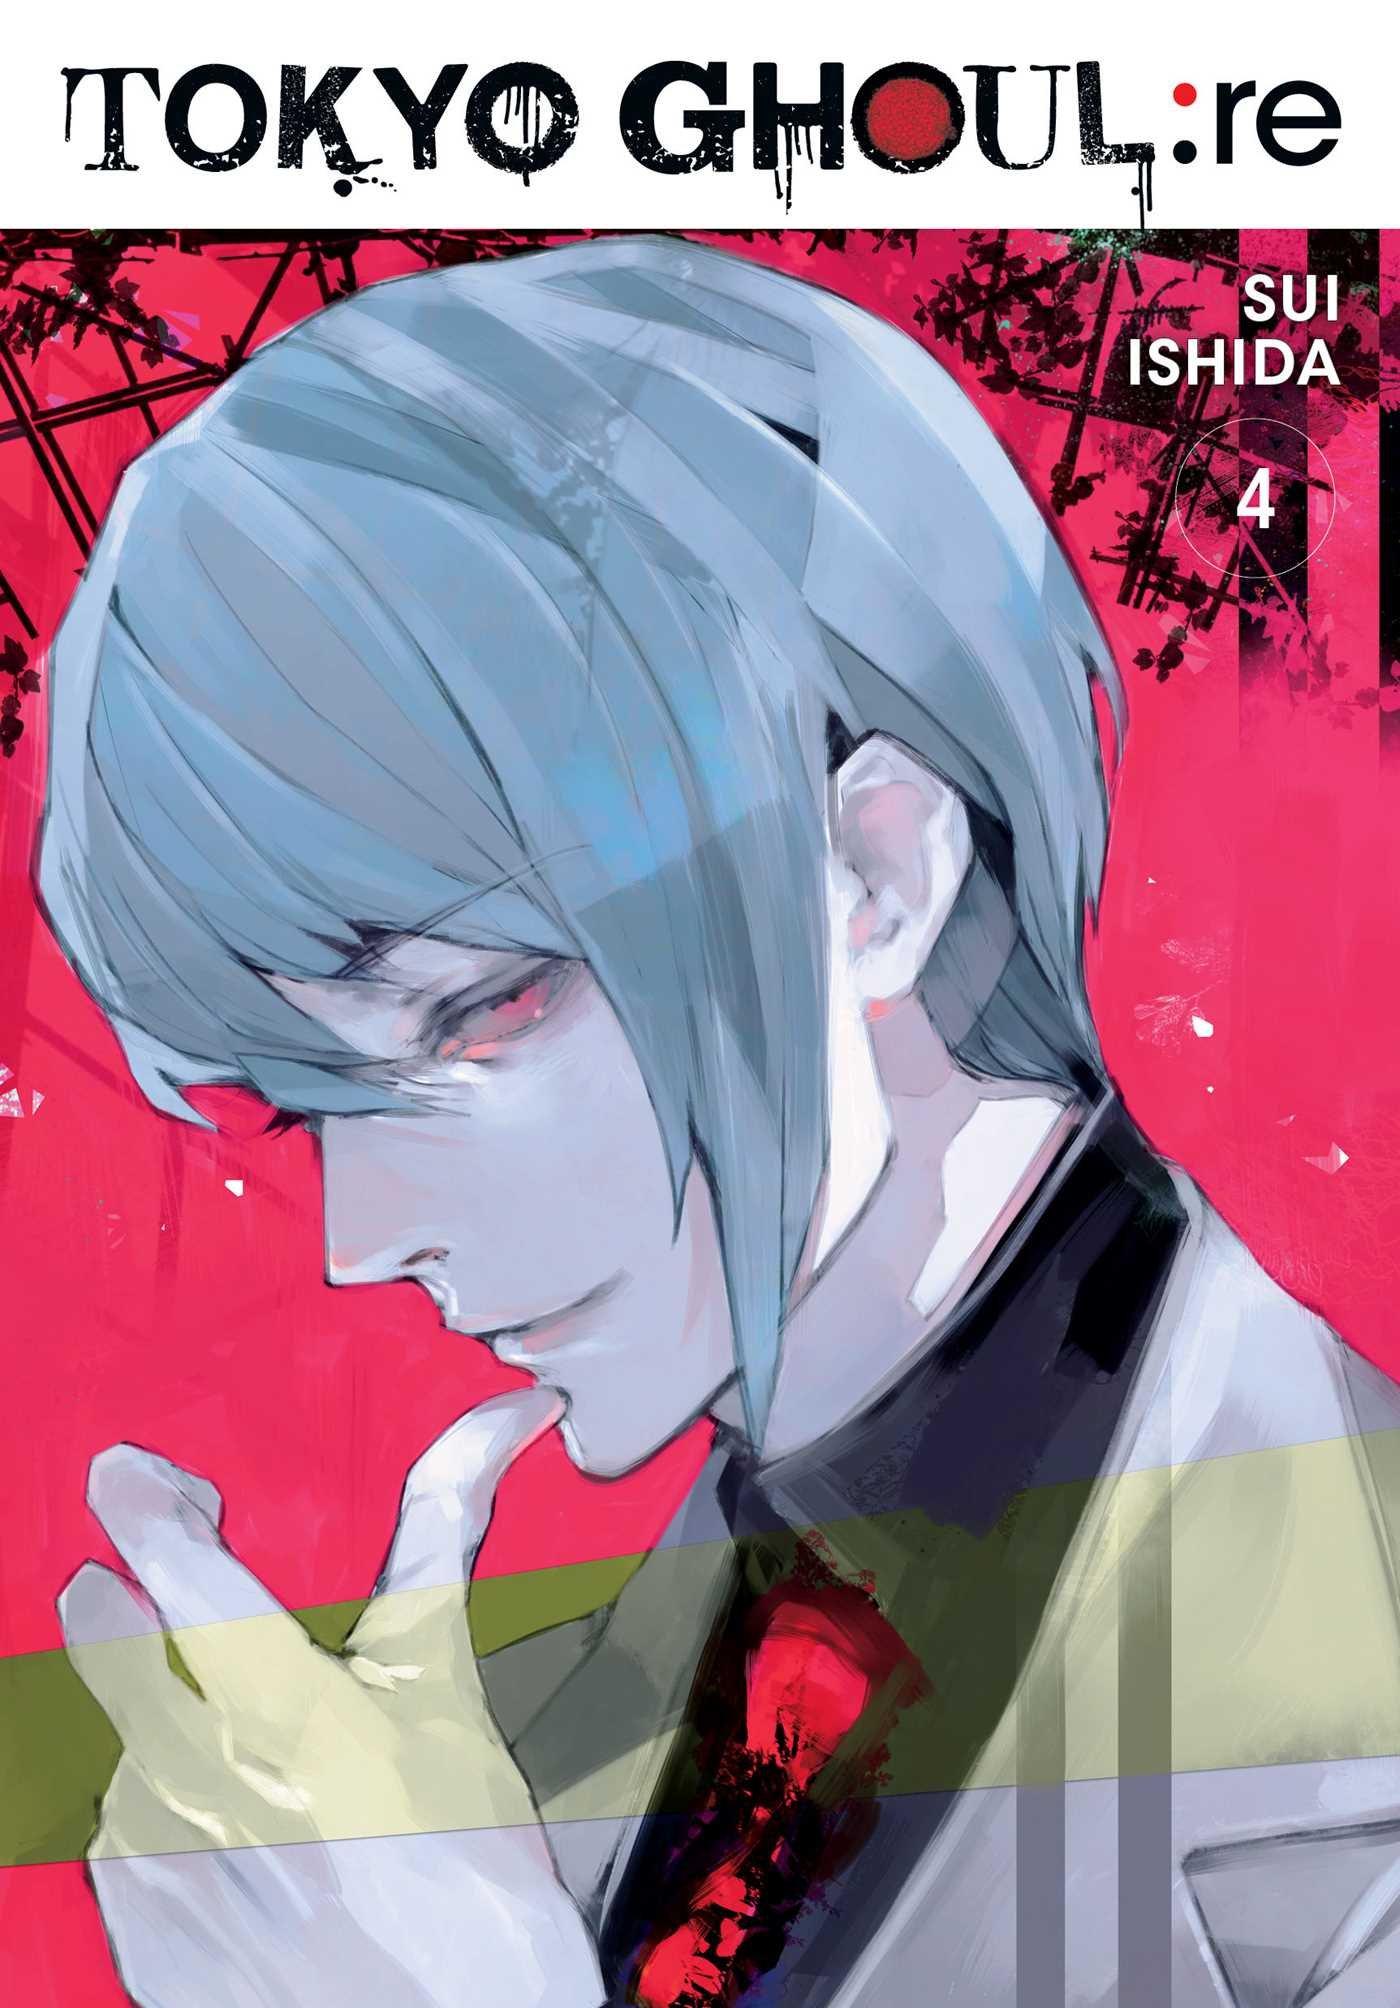 Tokyo Ghoul: re, Vol  4 (4): Sui Ishida: 0001421594994